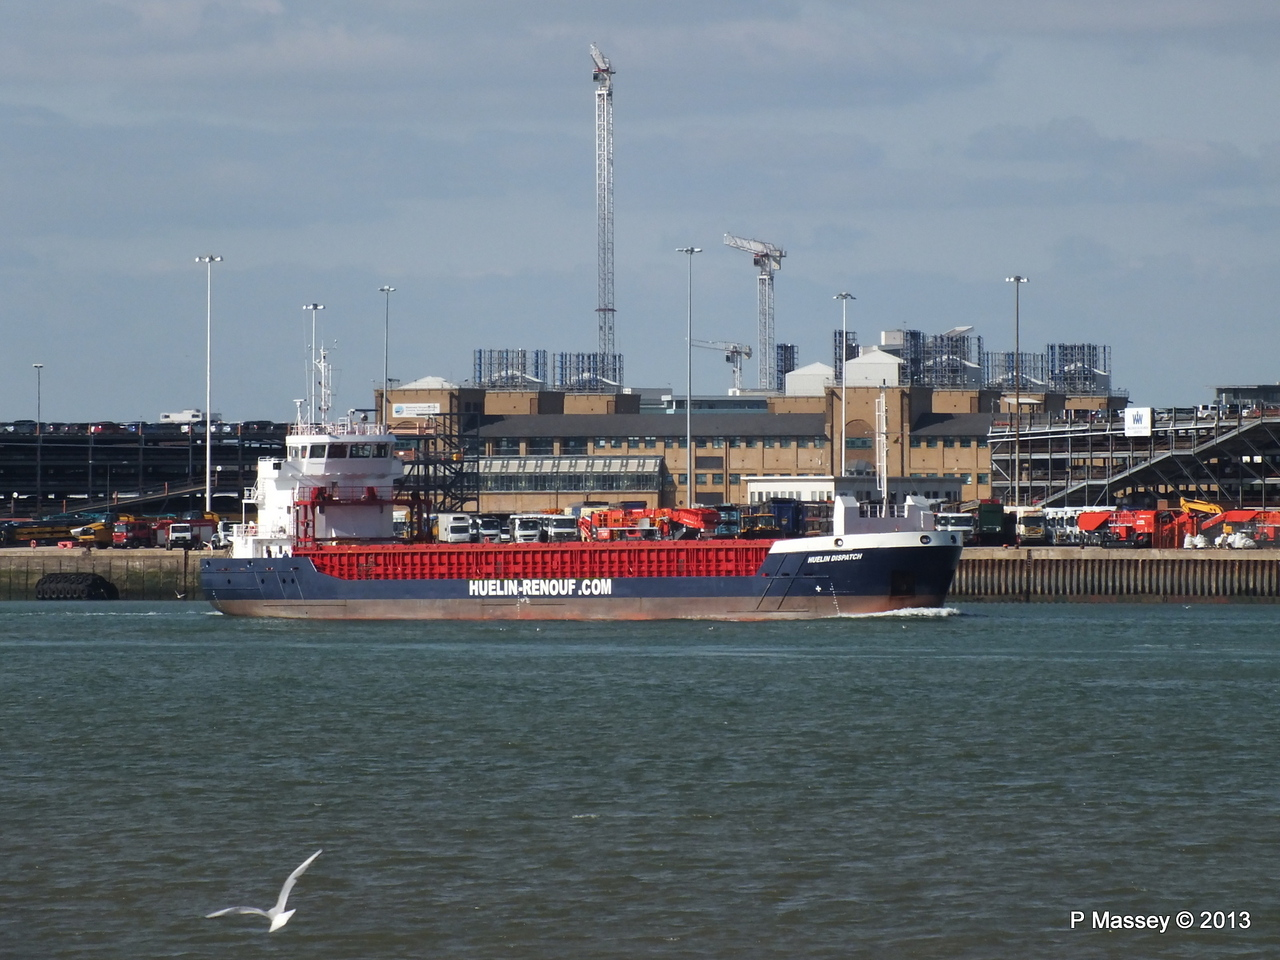 HUELIN DISPATCH Departing Southampton PDM 09-06-2013 17-28-56